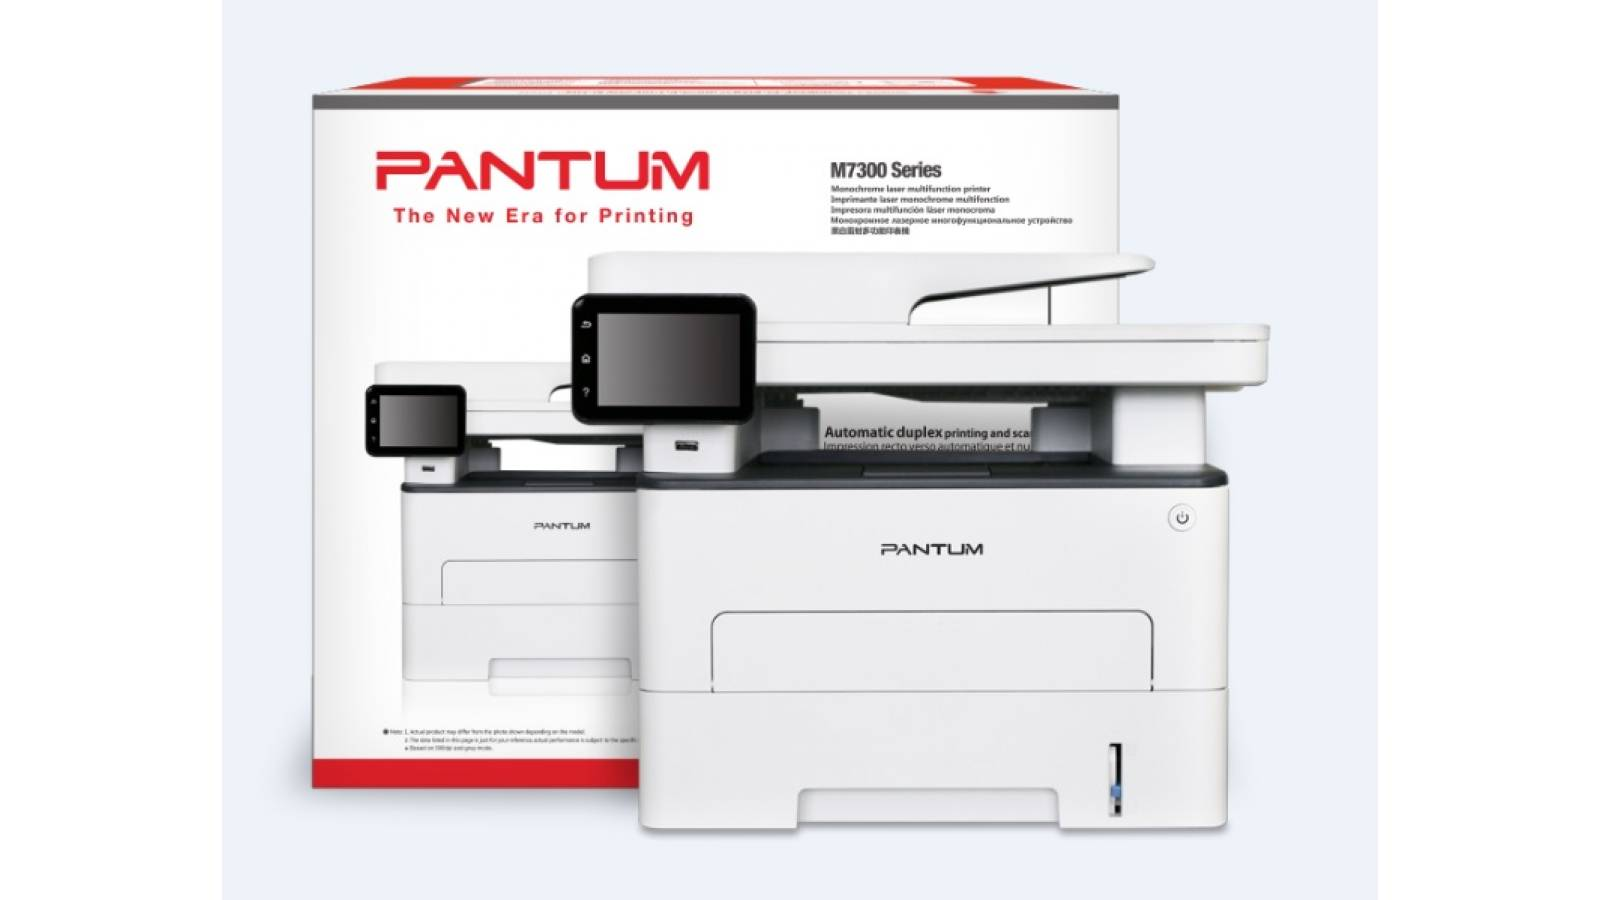 Multifuncional láser monocromática Pantum M7300DW